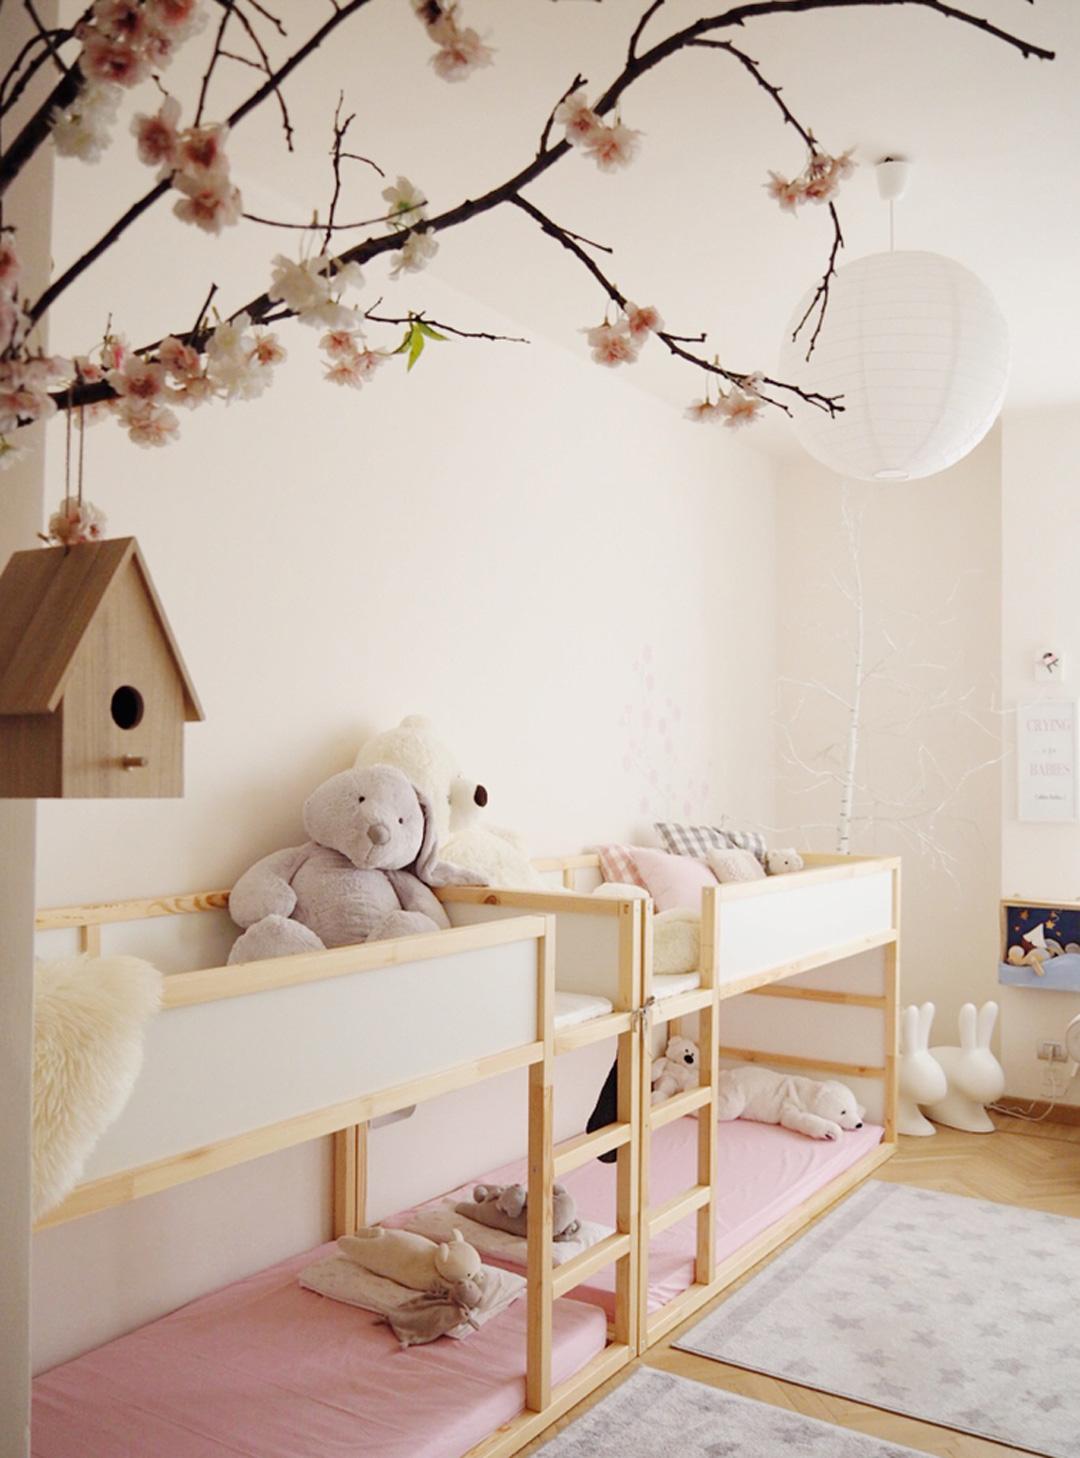 bunk bed ideas for 4 children